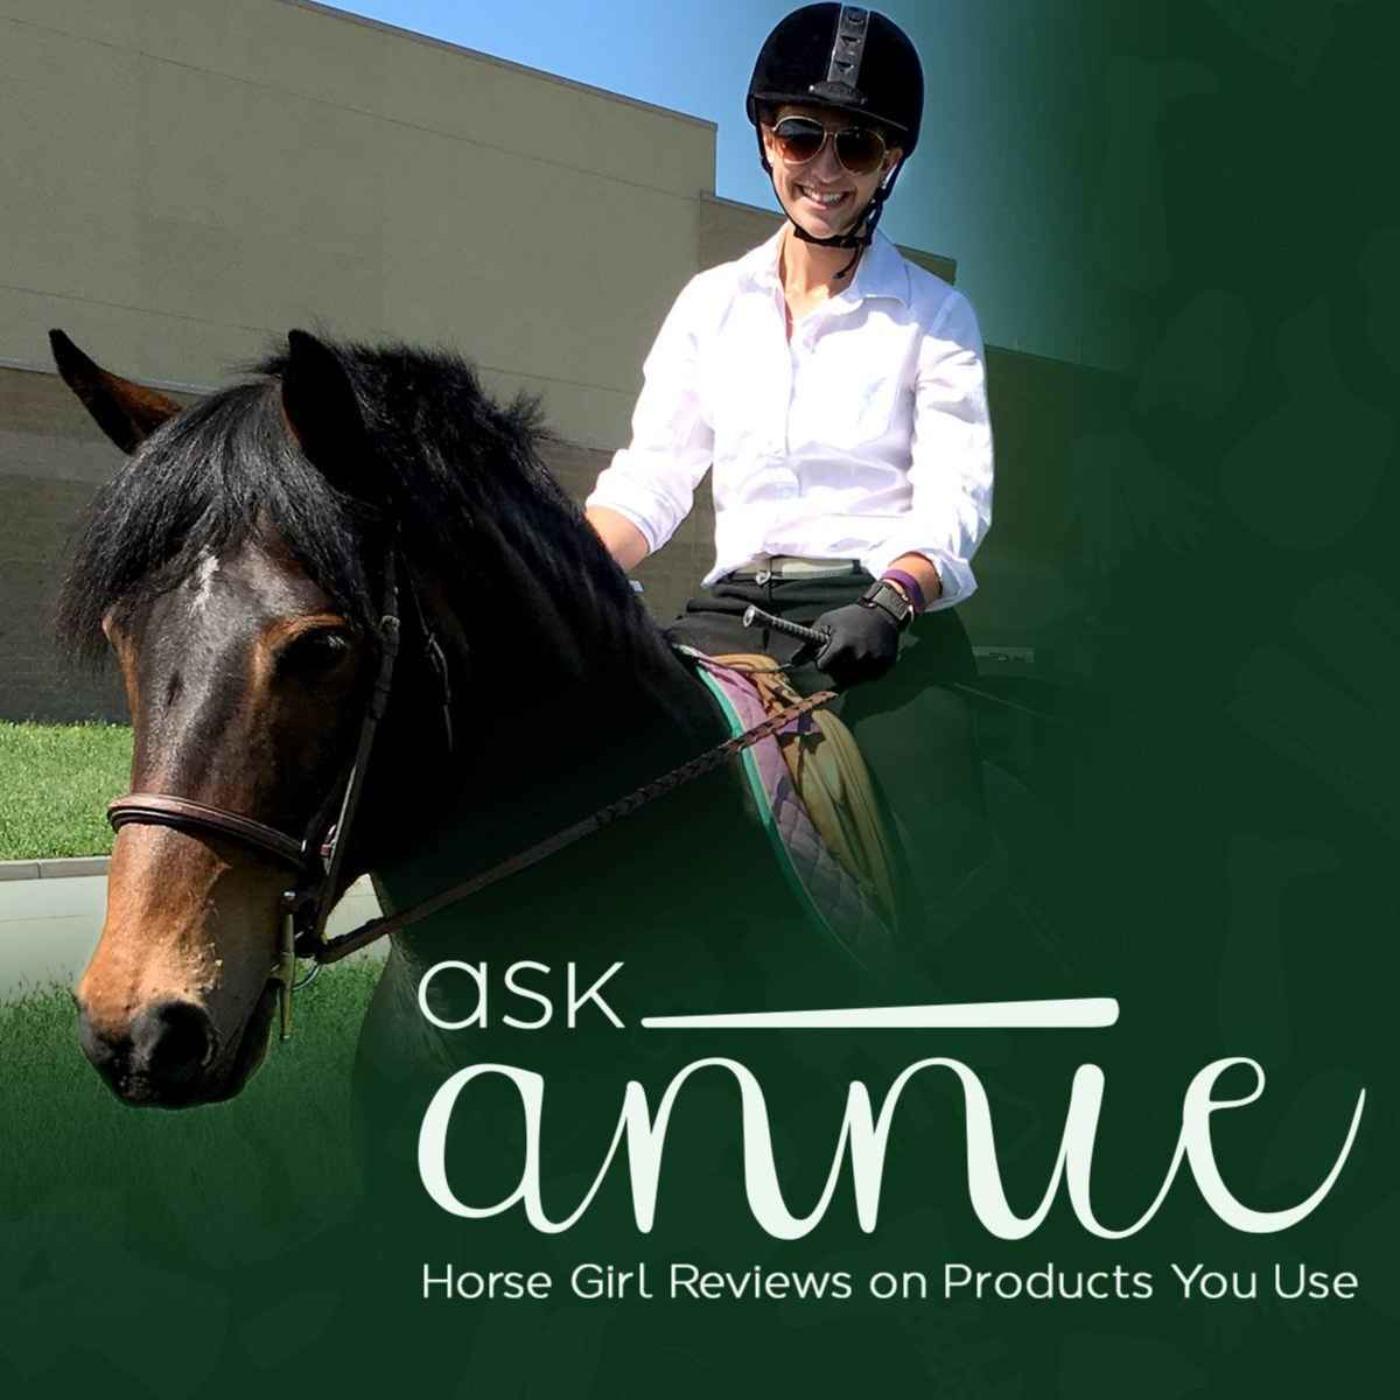 #AskAnnie - Episode 57: Woodrow Star, Hamley & Co.